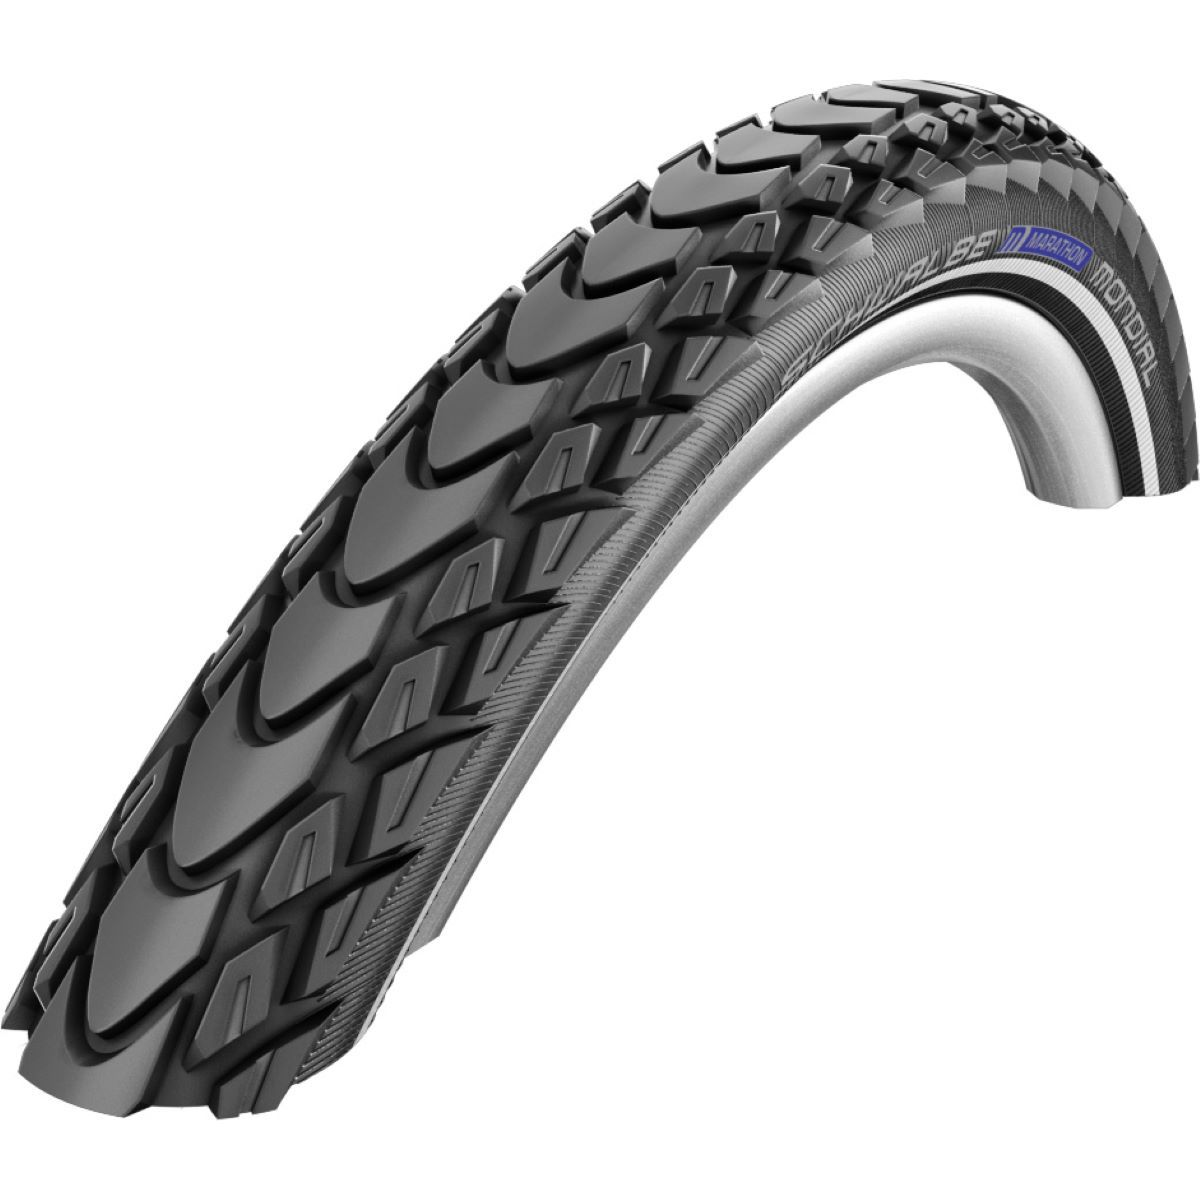 Schwalbe Marathon Mondial Touring Tyre Dd Tyres Lets Go Touring Bicycles Touring Bike Bicycle Tires